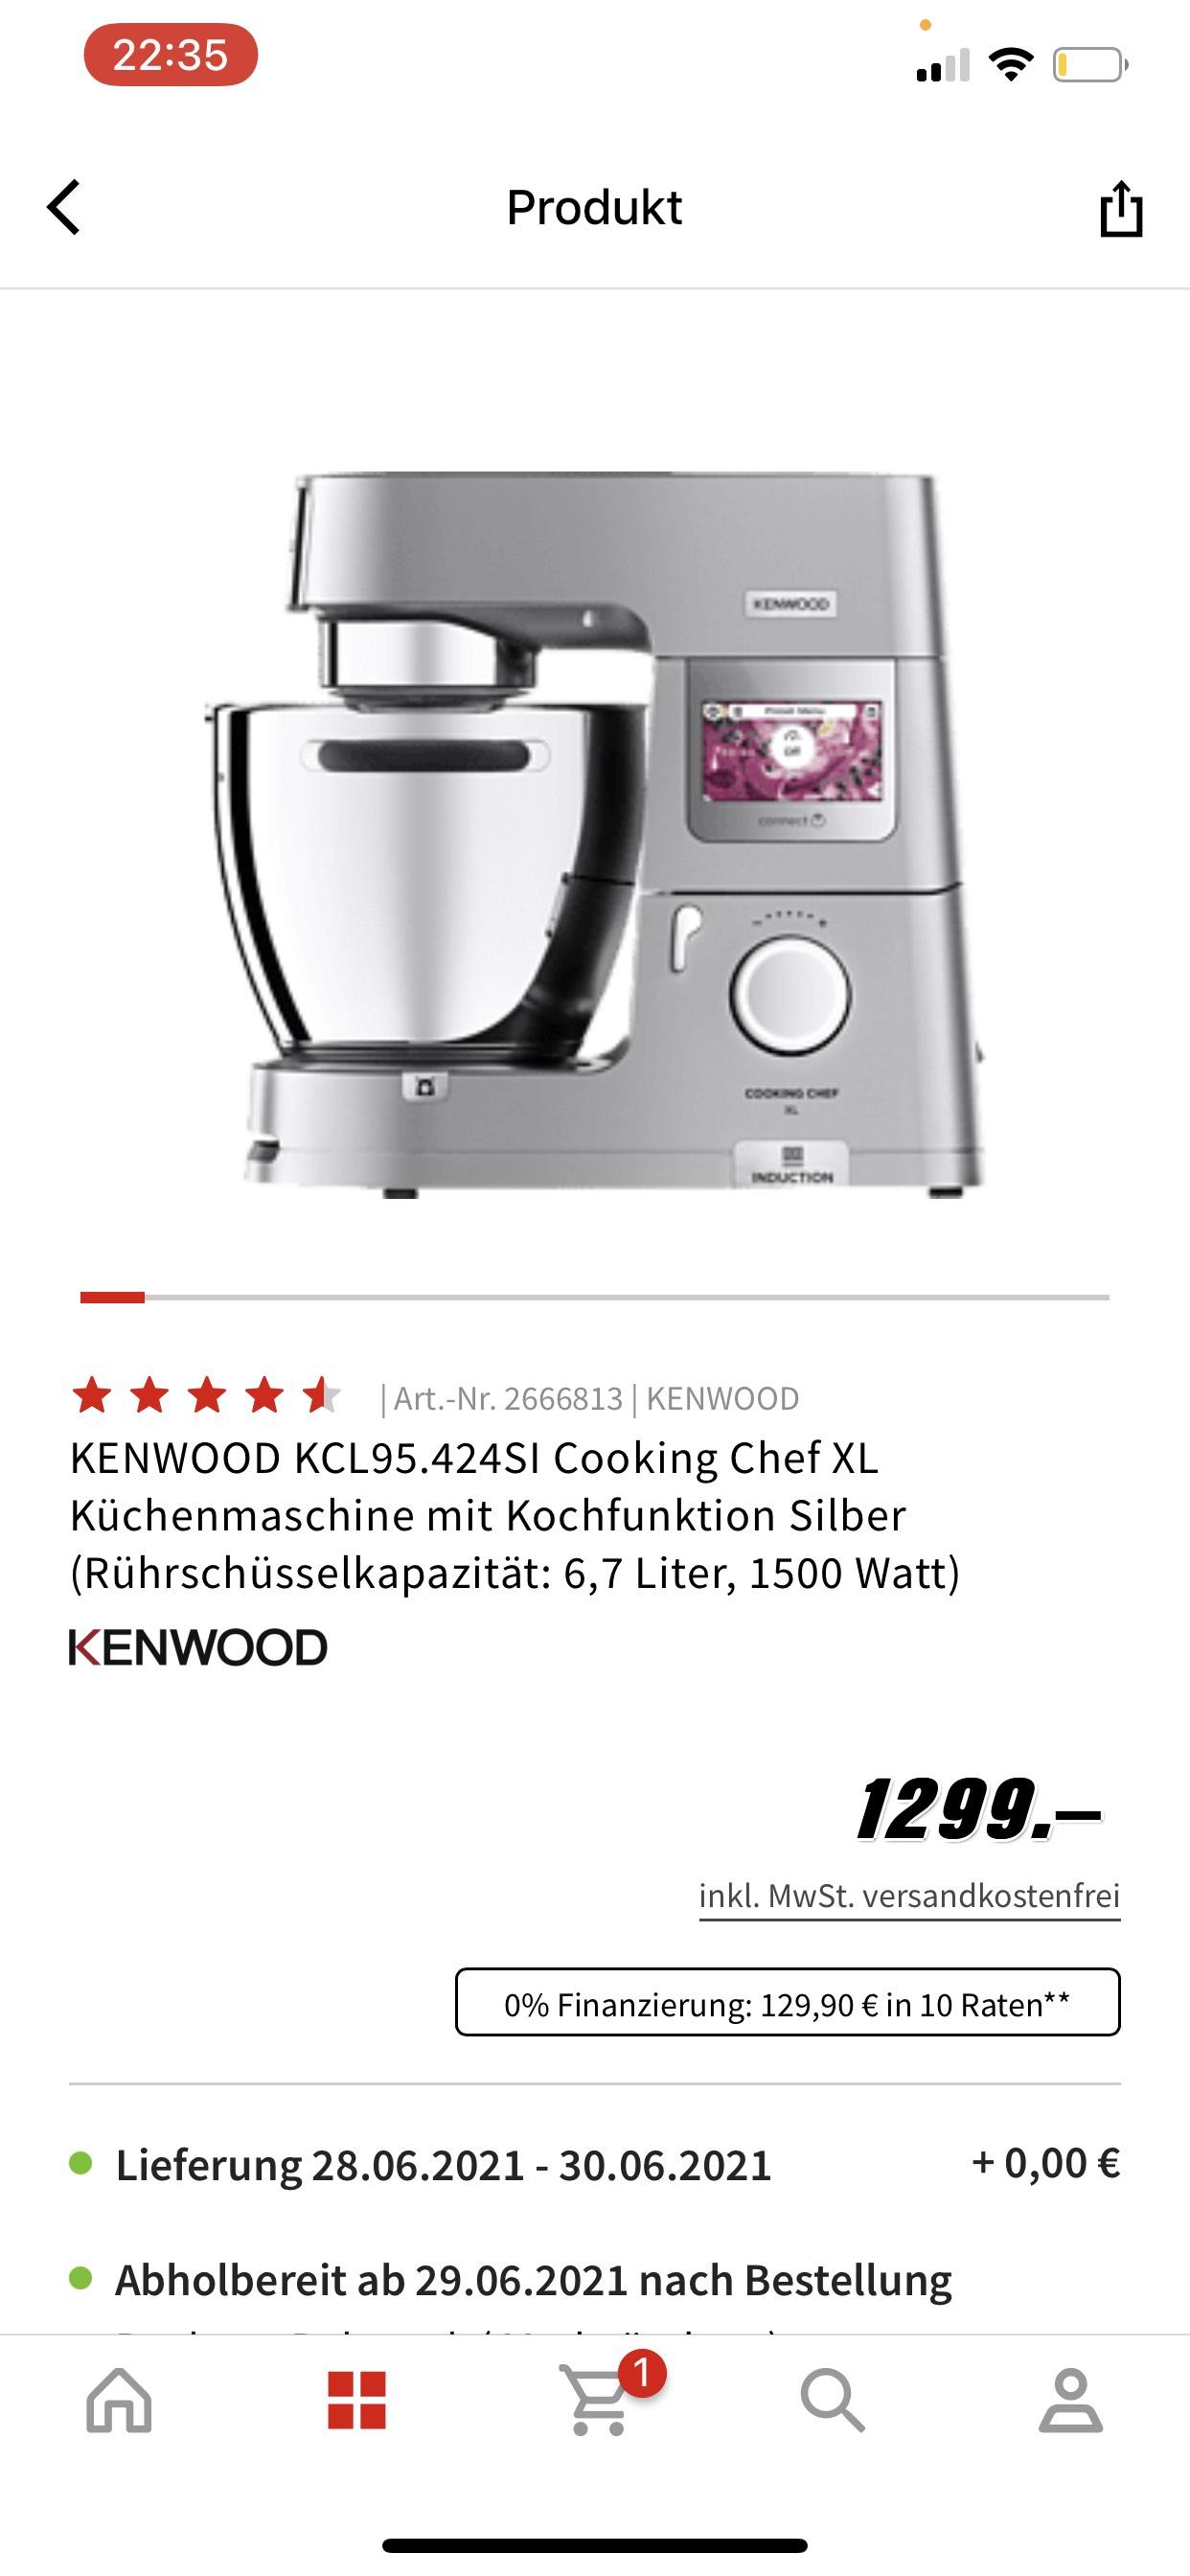 (Saturn) KENWOOD KCL95.424SI Cooking Chef XL - Direktabzug und NL